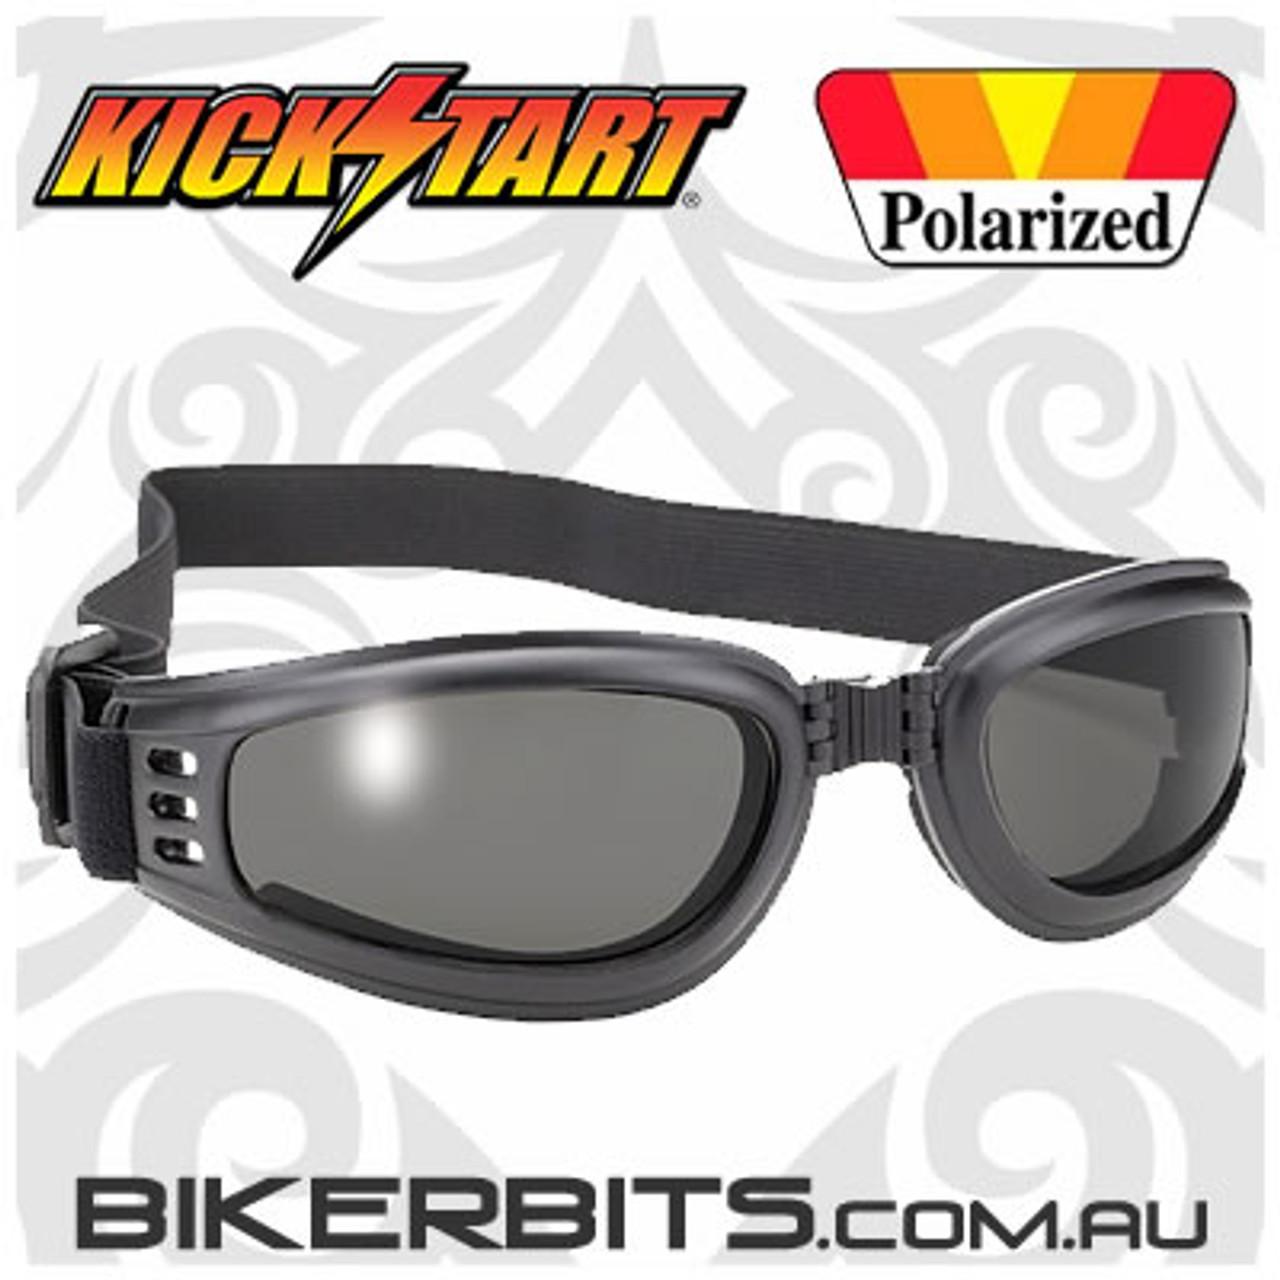 Motorcycle Goggles - Kickstart Nomad - Polarized Smoke/Black